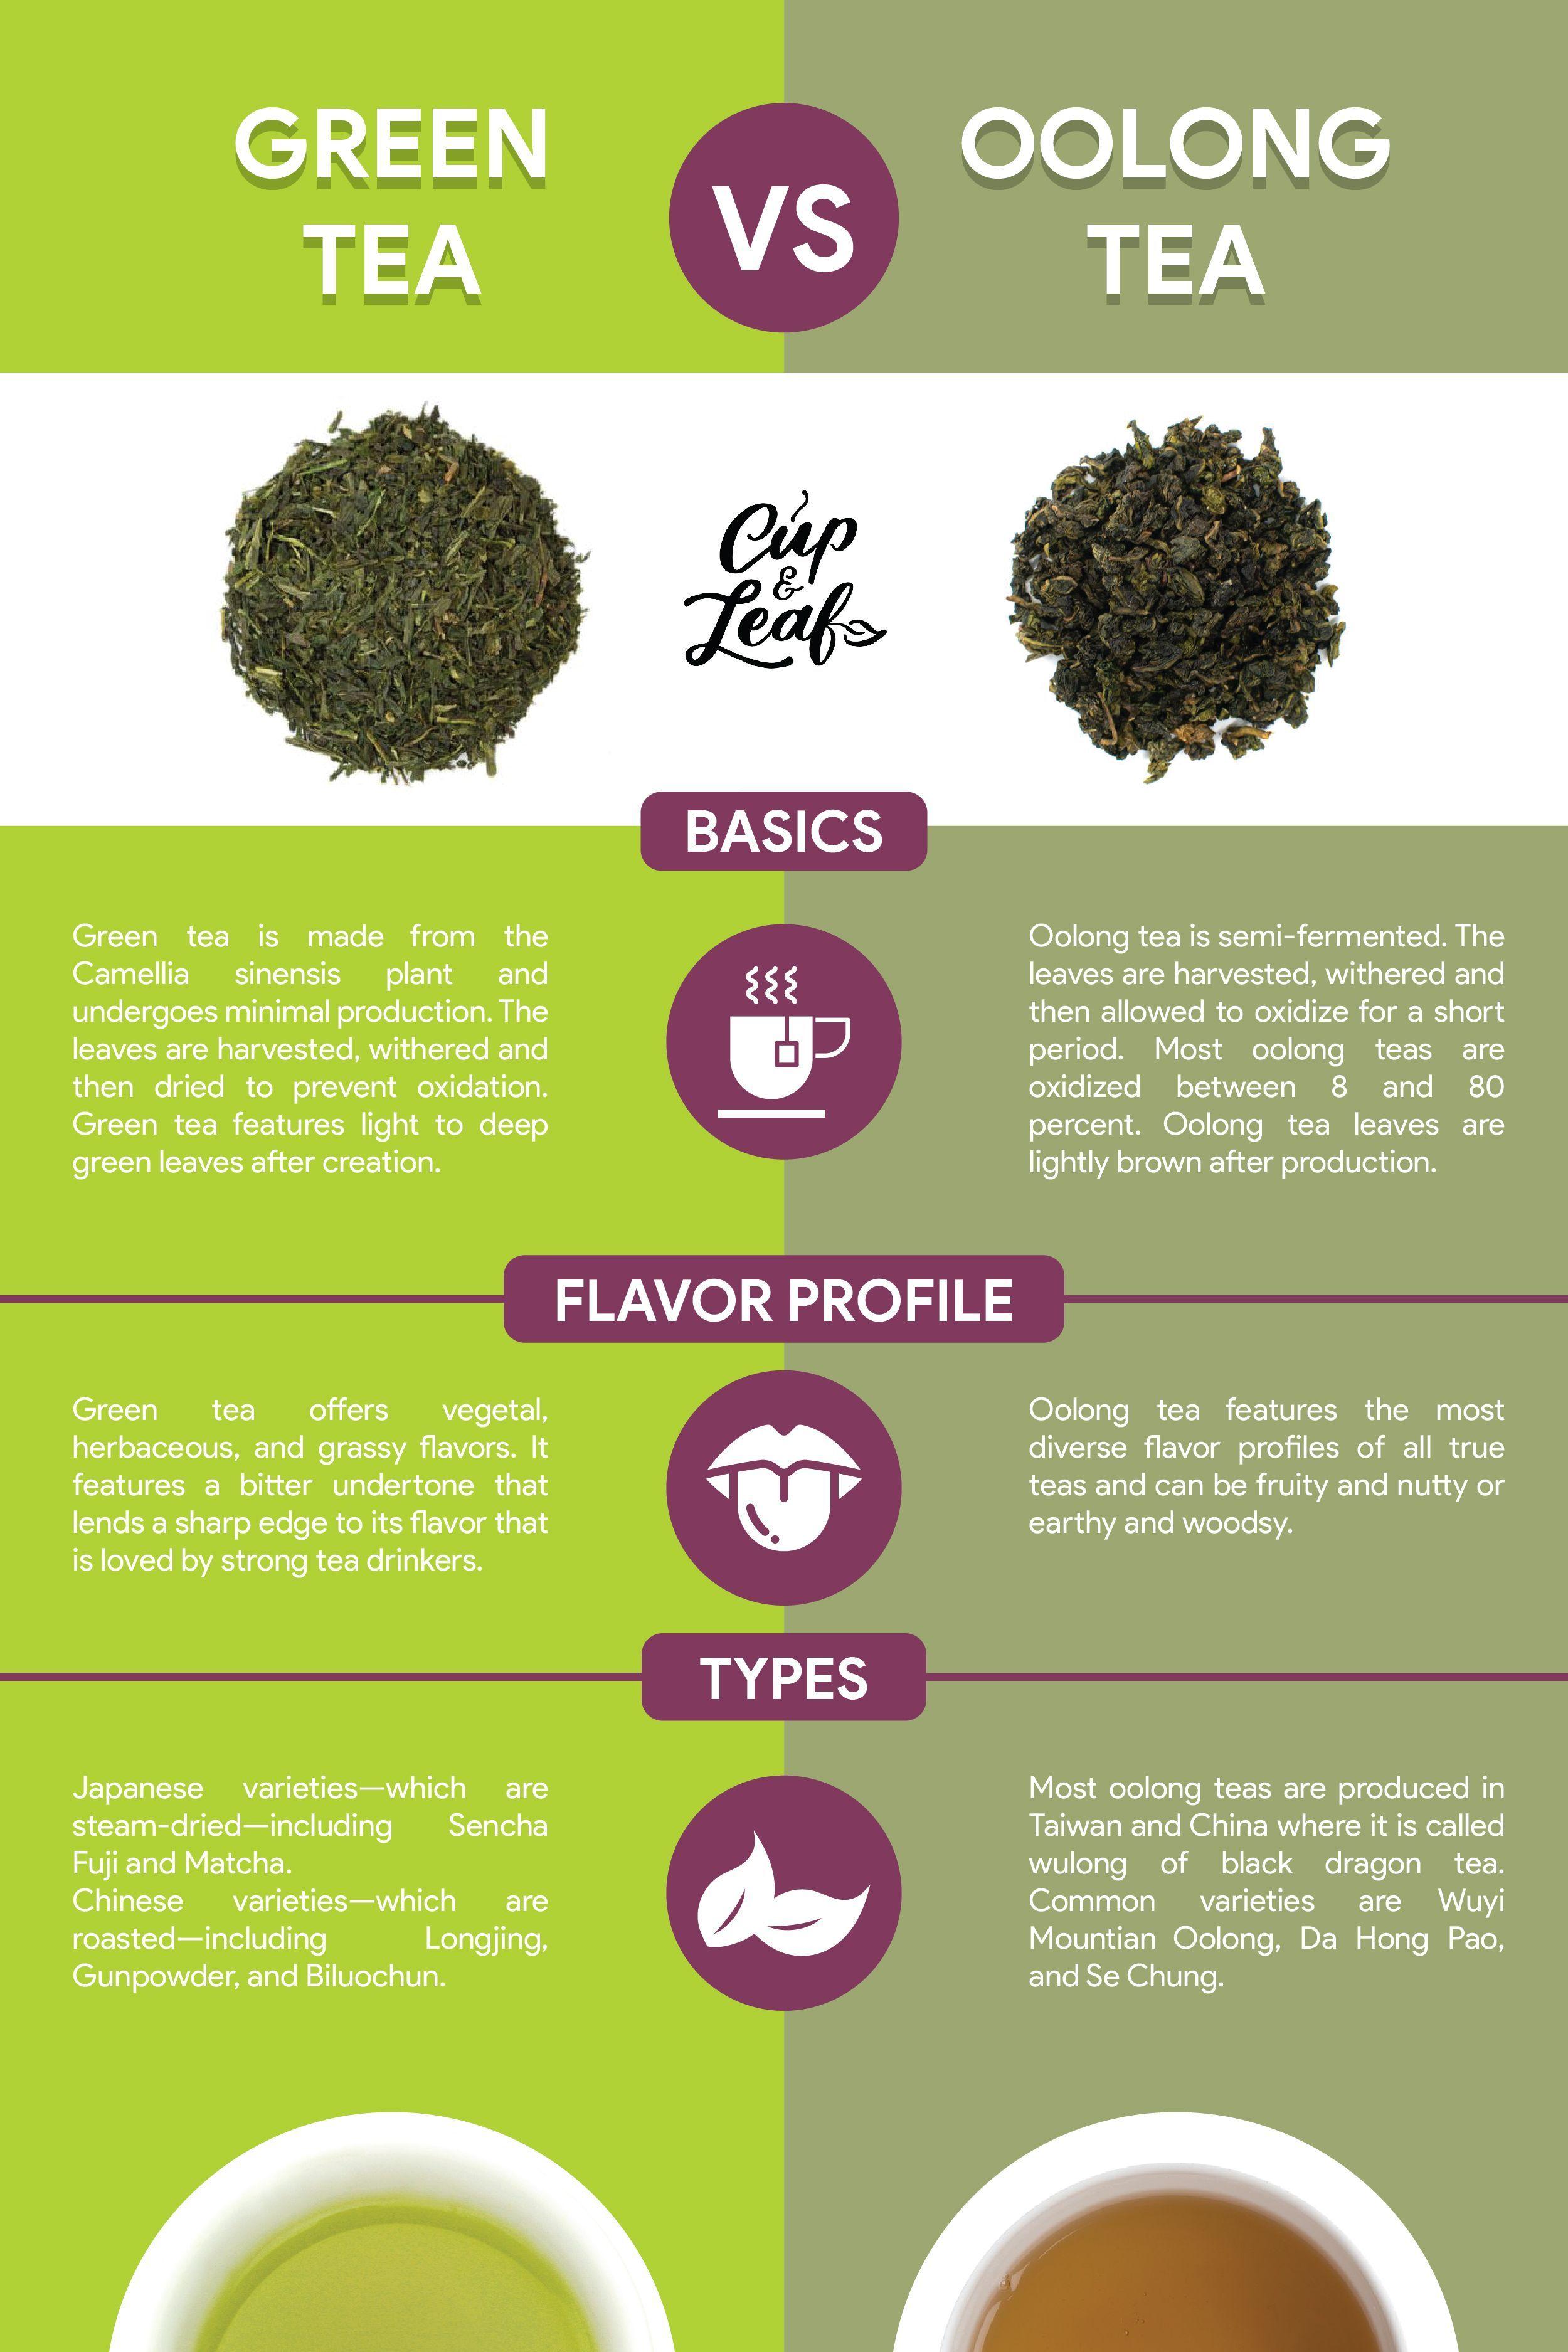 Oolong Tea Vs Green Tea Is One Healthier Than The Other Teacups Oolong Tea Vs Green Tea Is One Healthier Oolong Tea Oolong Tea Benefits Green Tea Recipes